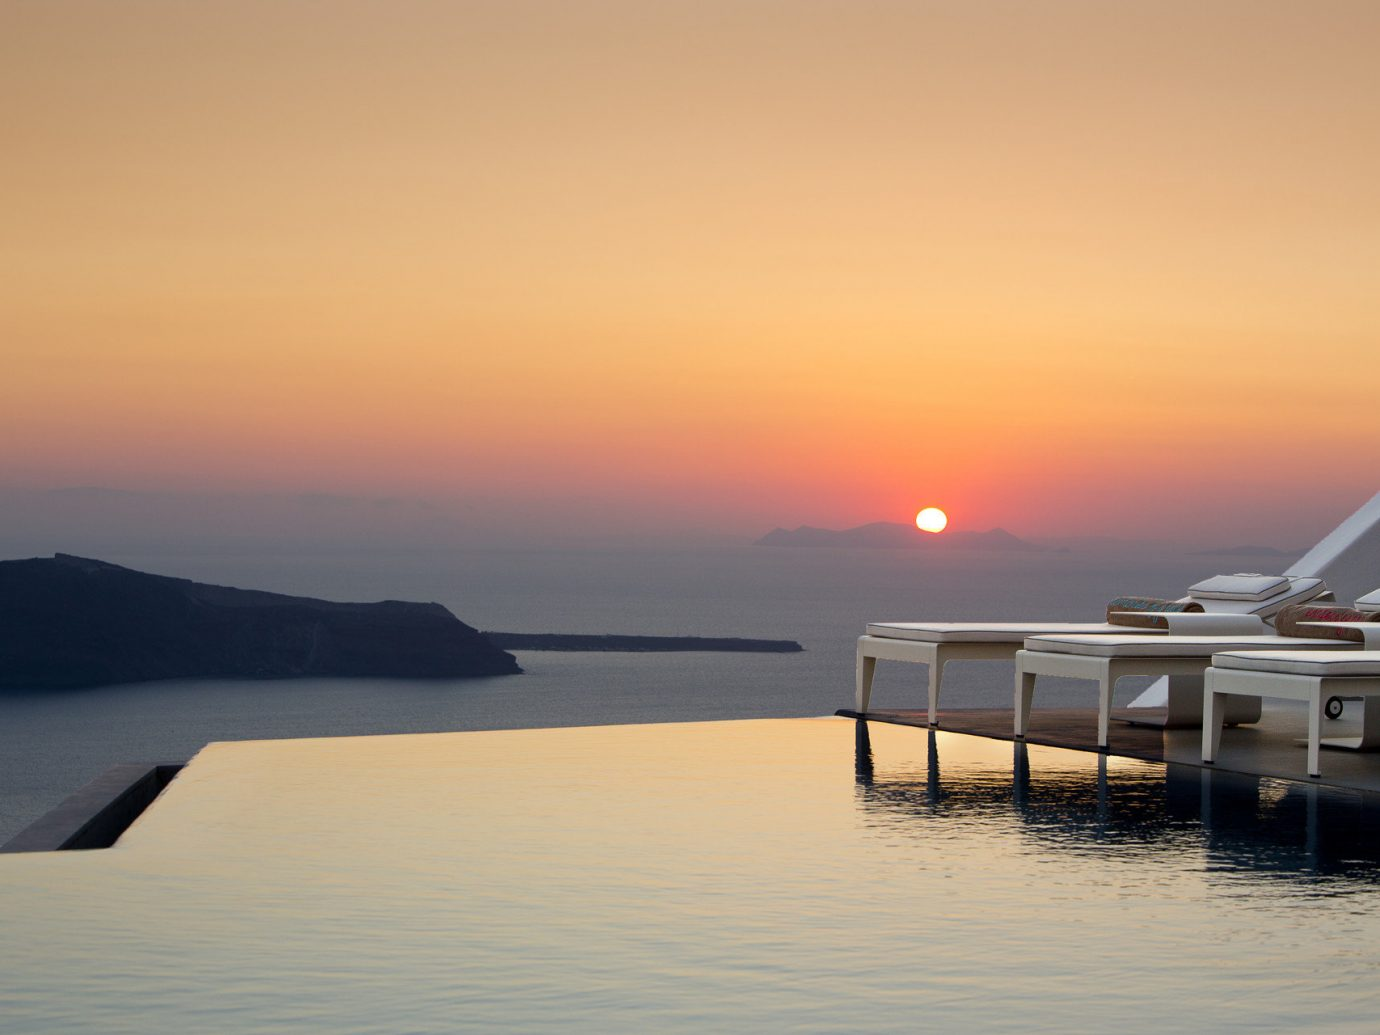 Infinity Hotel At The Grace Santorini Hotel In Greece